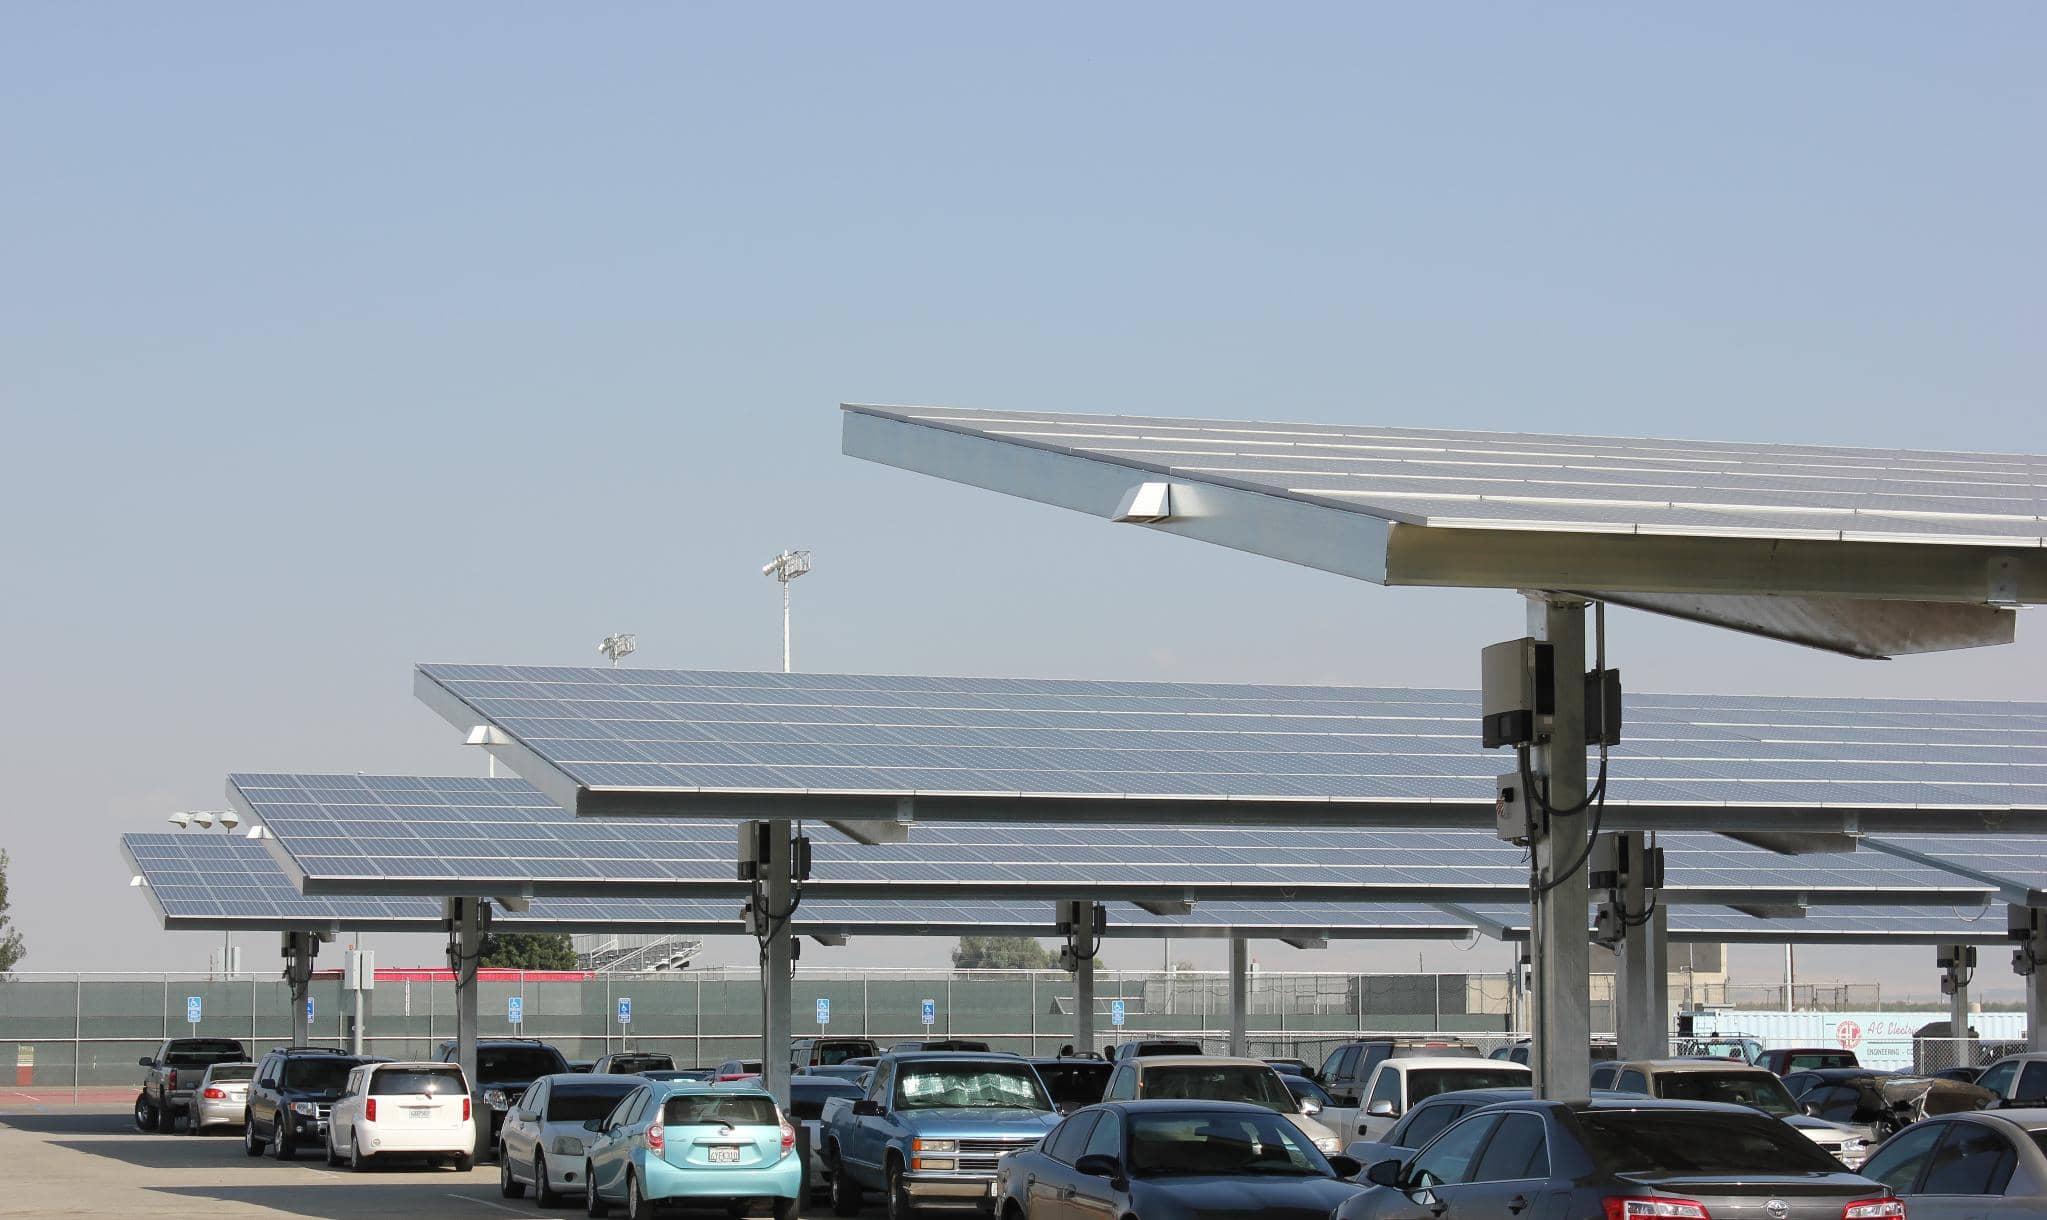 sunpower-2 SunPower And University Partner On 4 MW Of Solar Carports